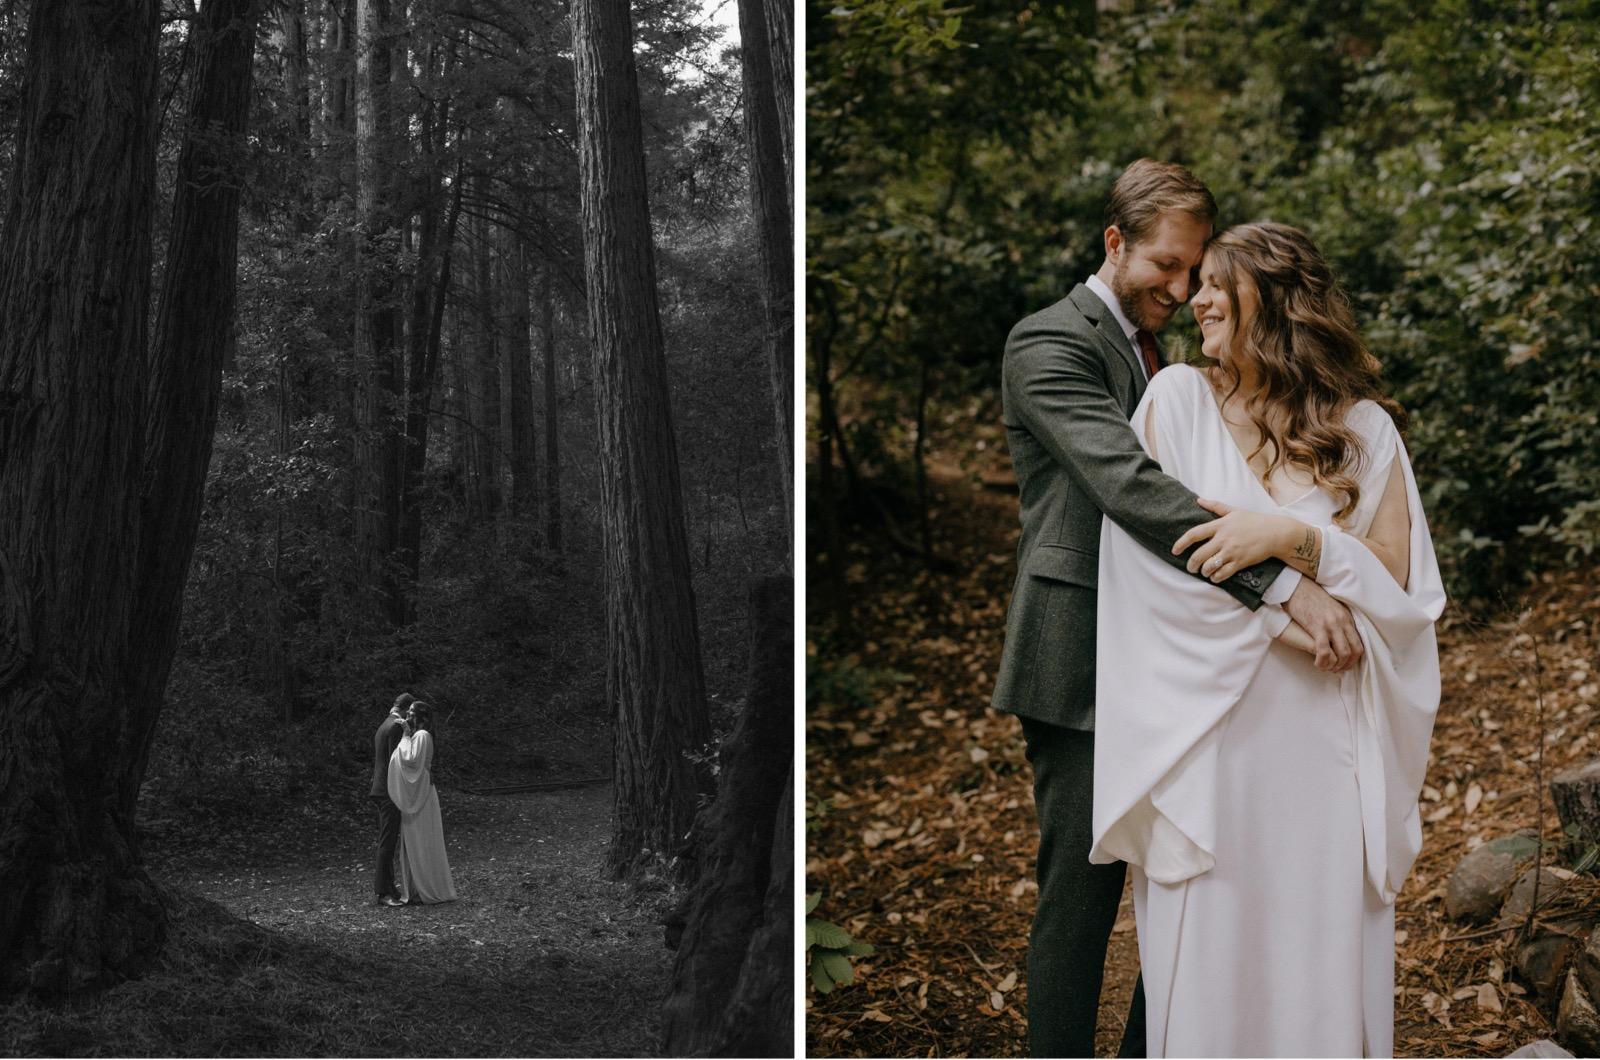 091_Emily & Jeff Wedding 0841_E&J 04312_the-waterfall-lodge_forest_wedding_ben-lomond_intimate